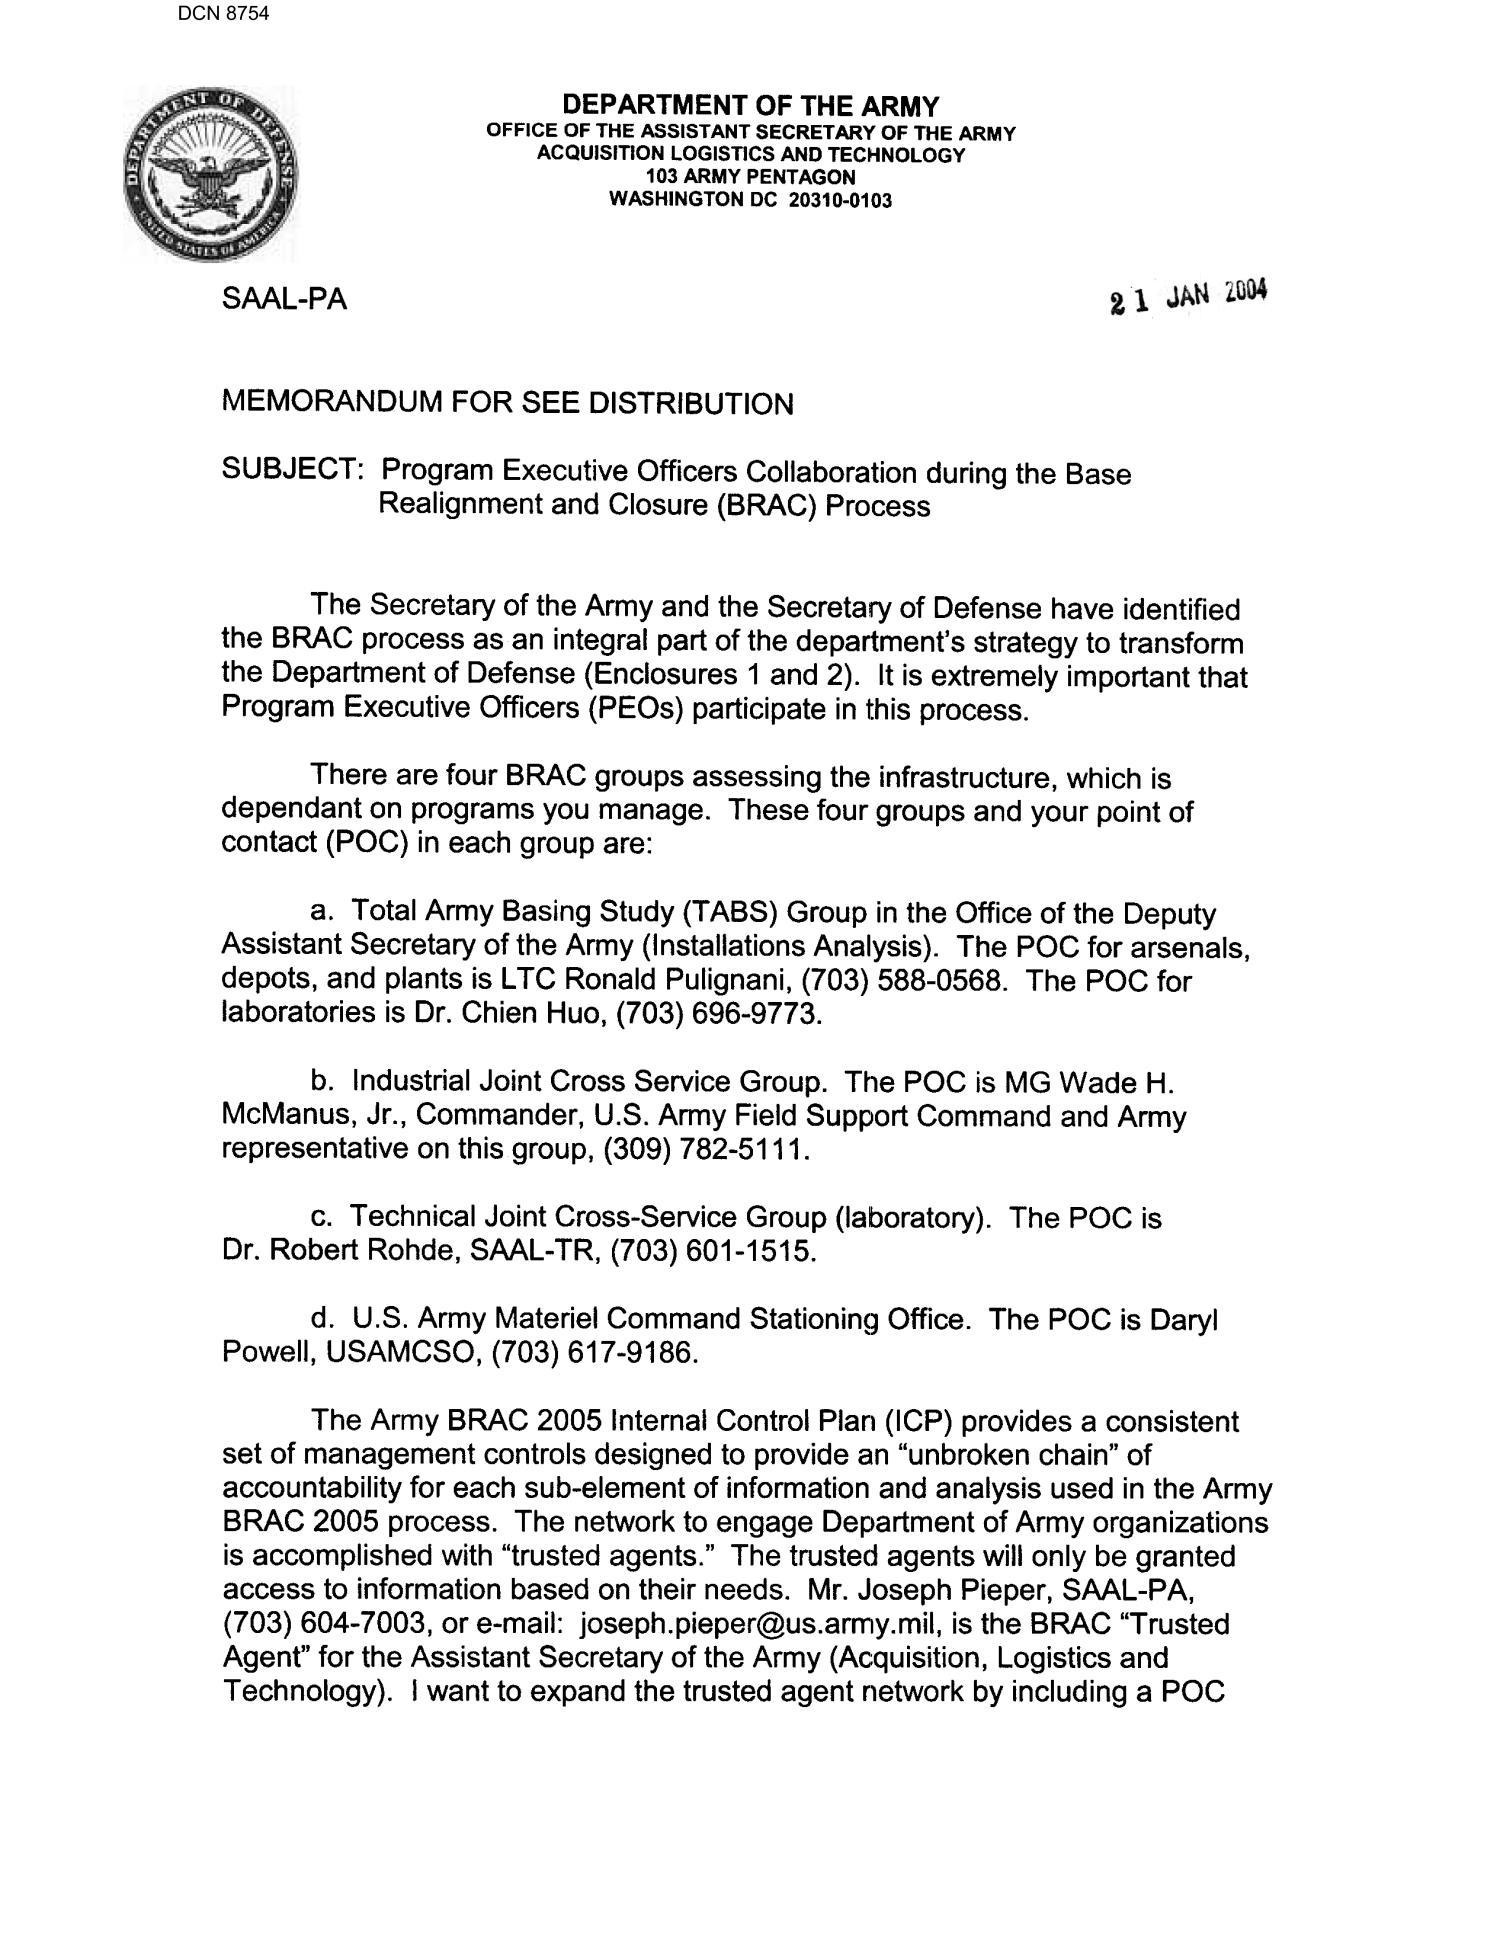 Memorandum For See Distribution Page 1 Of 3 Digital